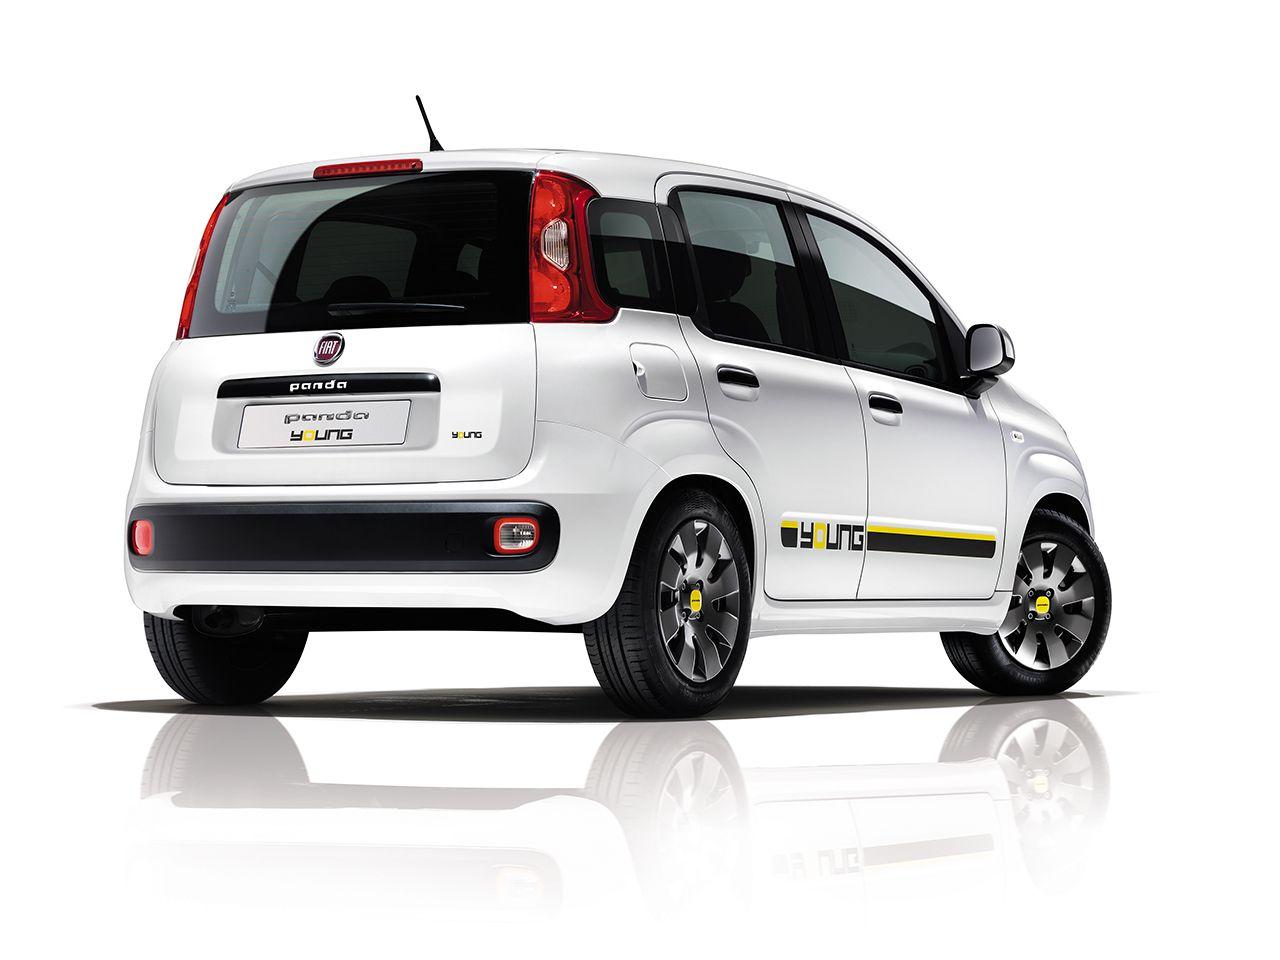 Fiat Panda Young M 225 S Equipamiento A Precio Competitivo